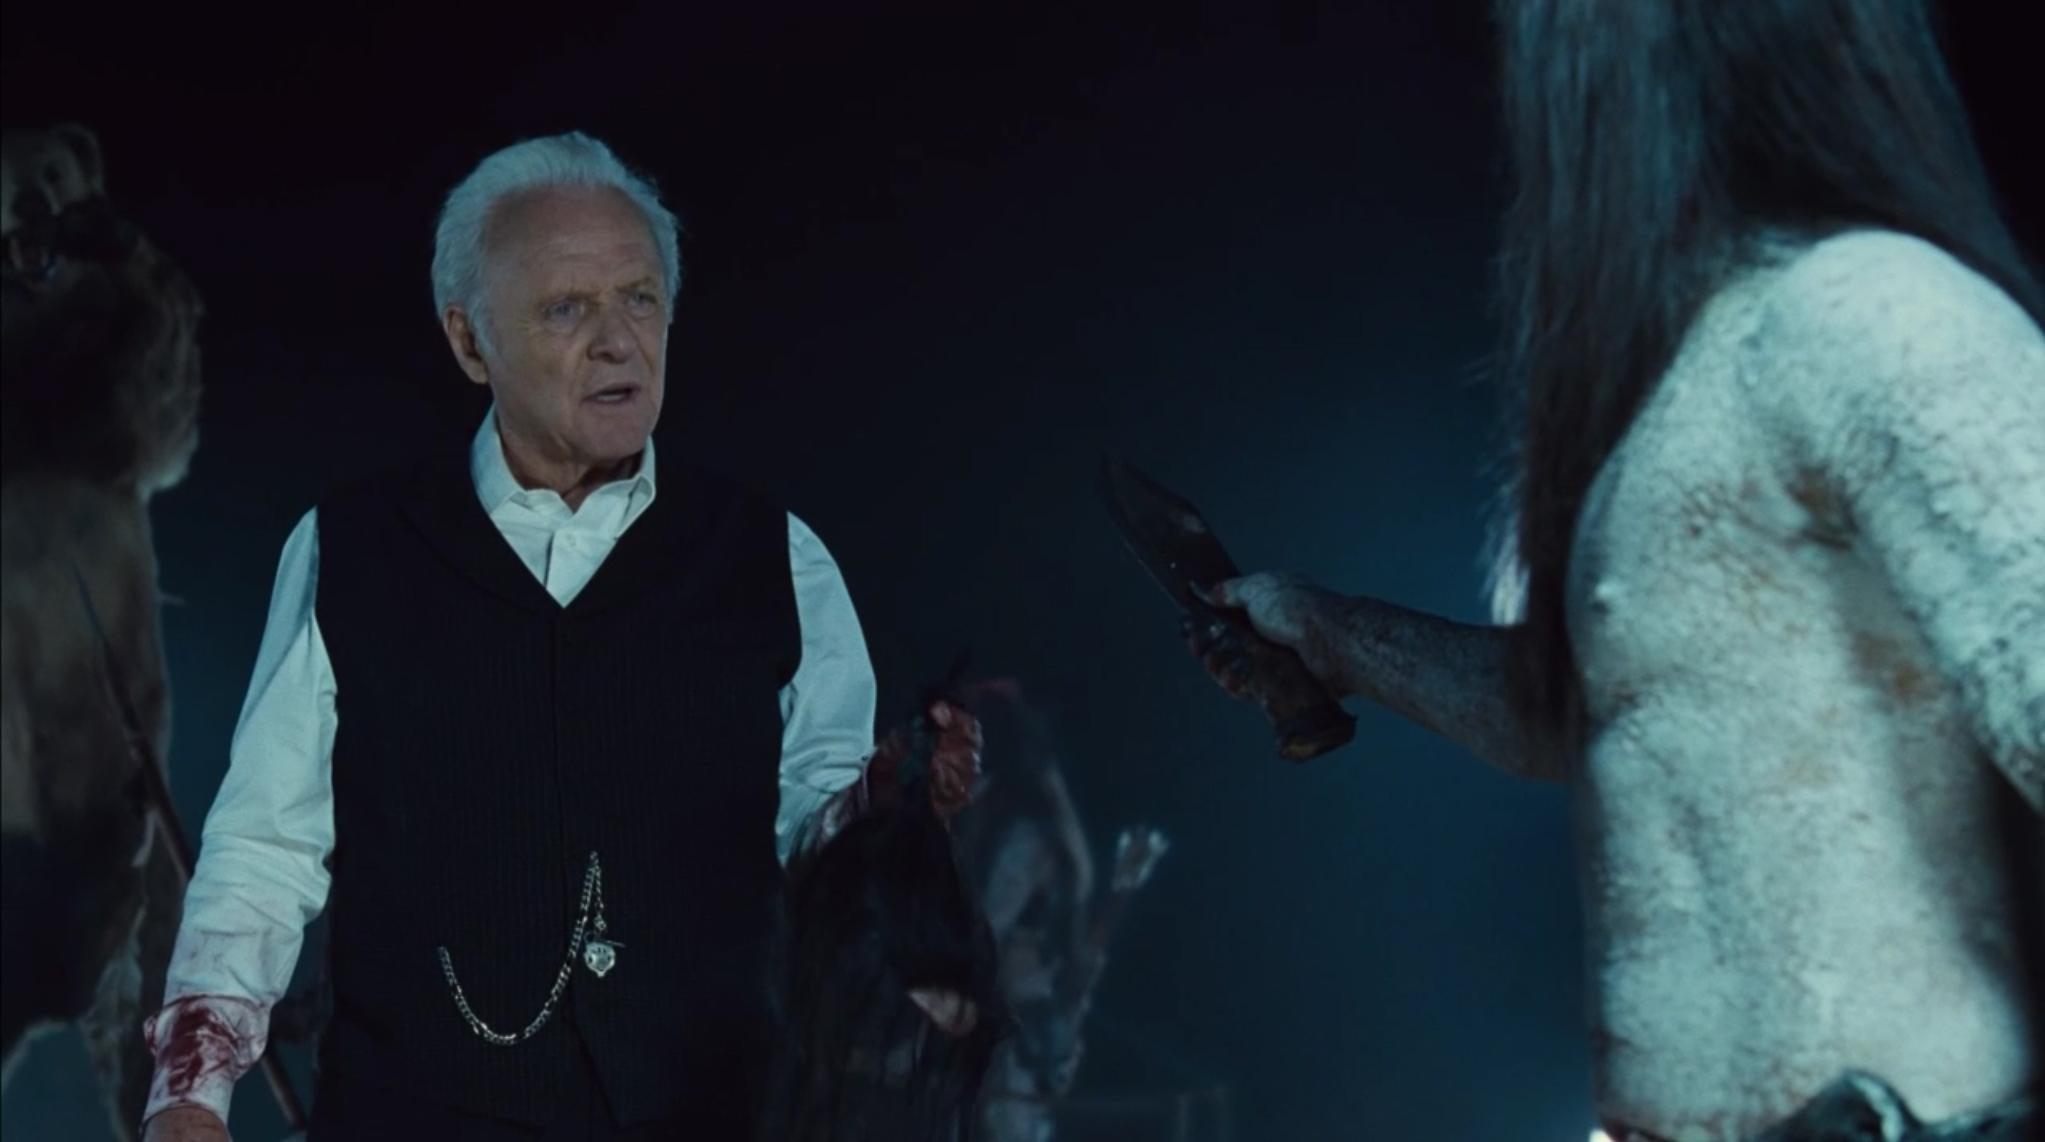 Westworld season 2 episode 8 felt like an optional DLC